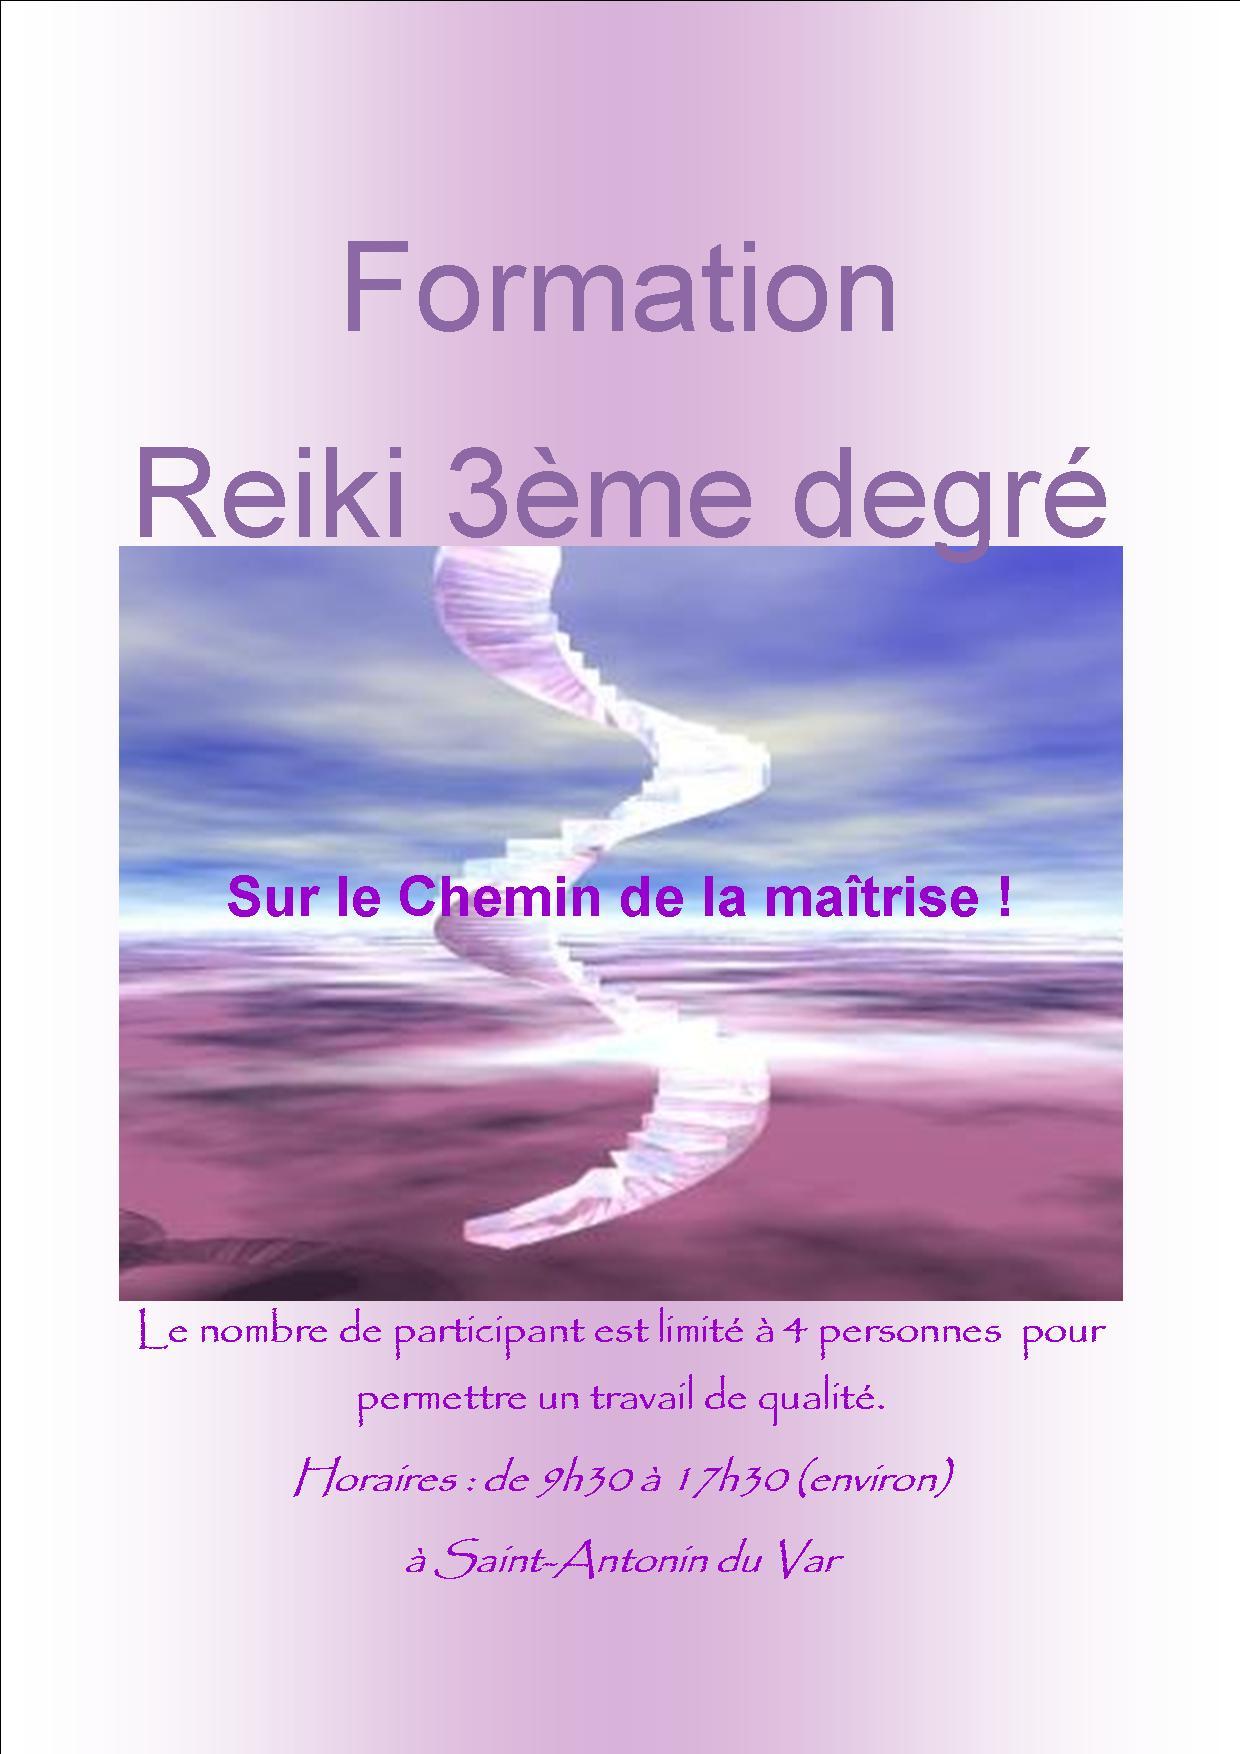 Formation 3eme degre